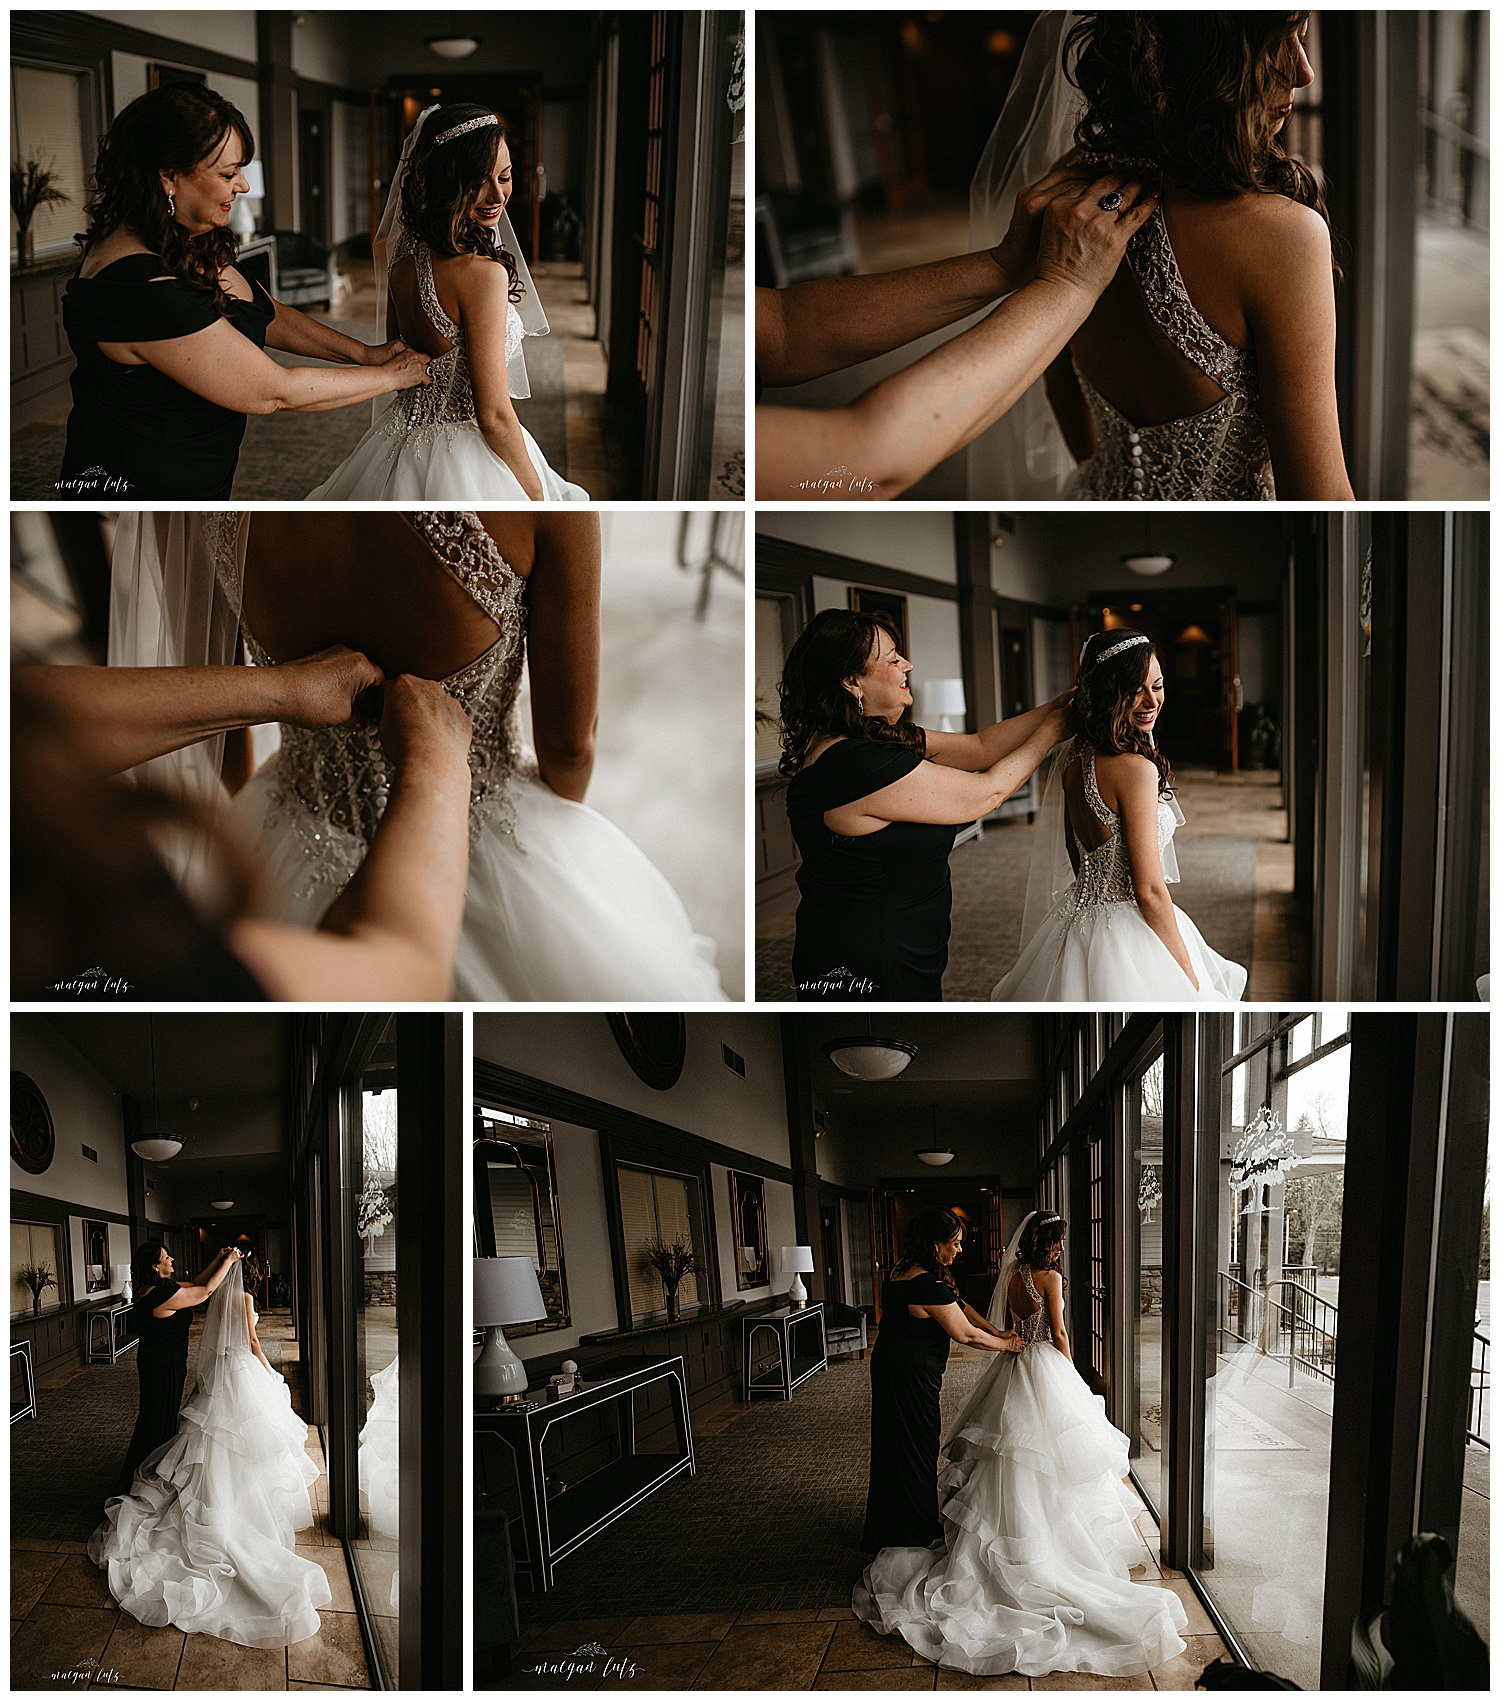 NEPA-Lehigh-Valley-Wedding-Photographer-at-Glen-Oak-Country-Club-Clarks-Summit-PA_0008.jpg